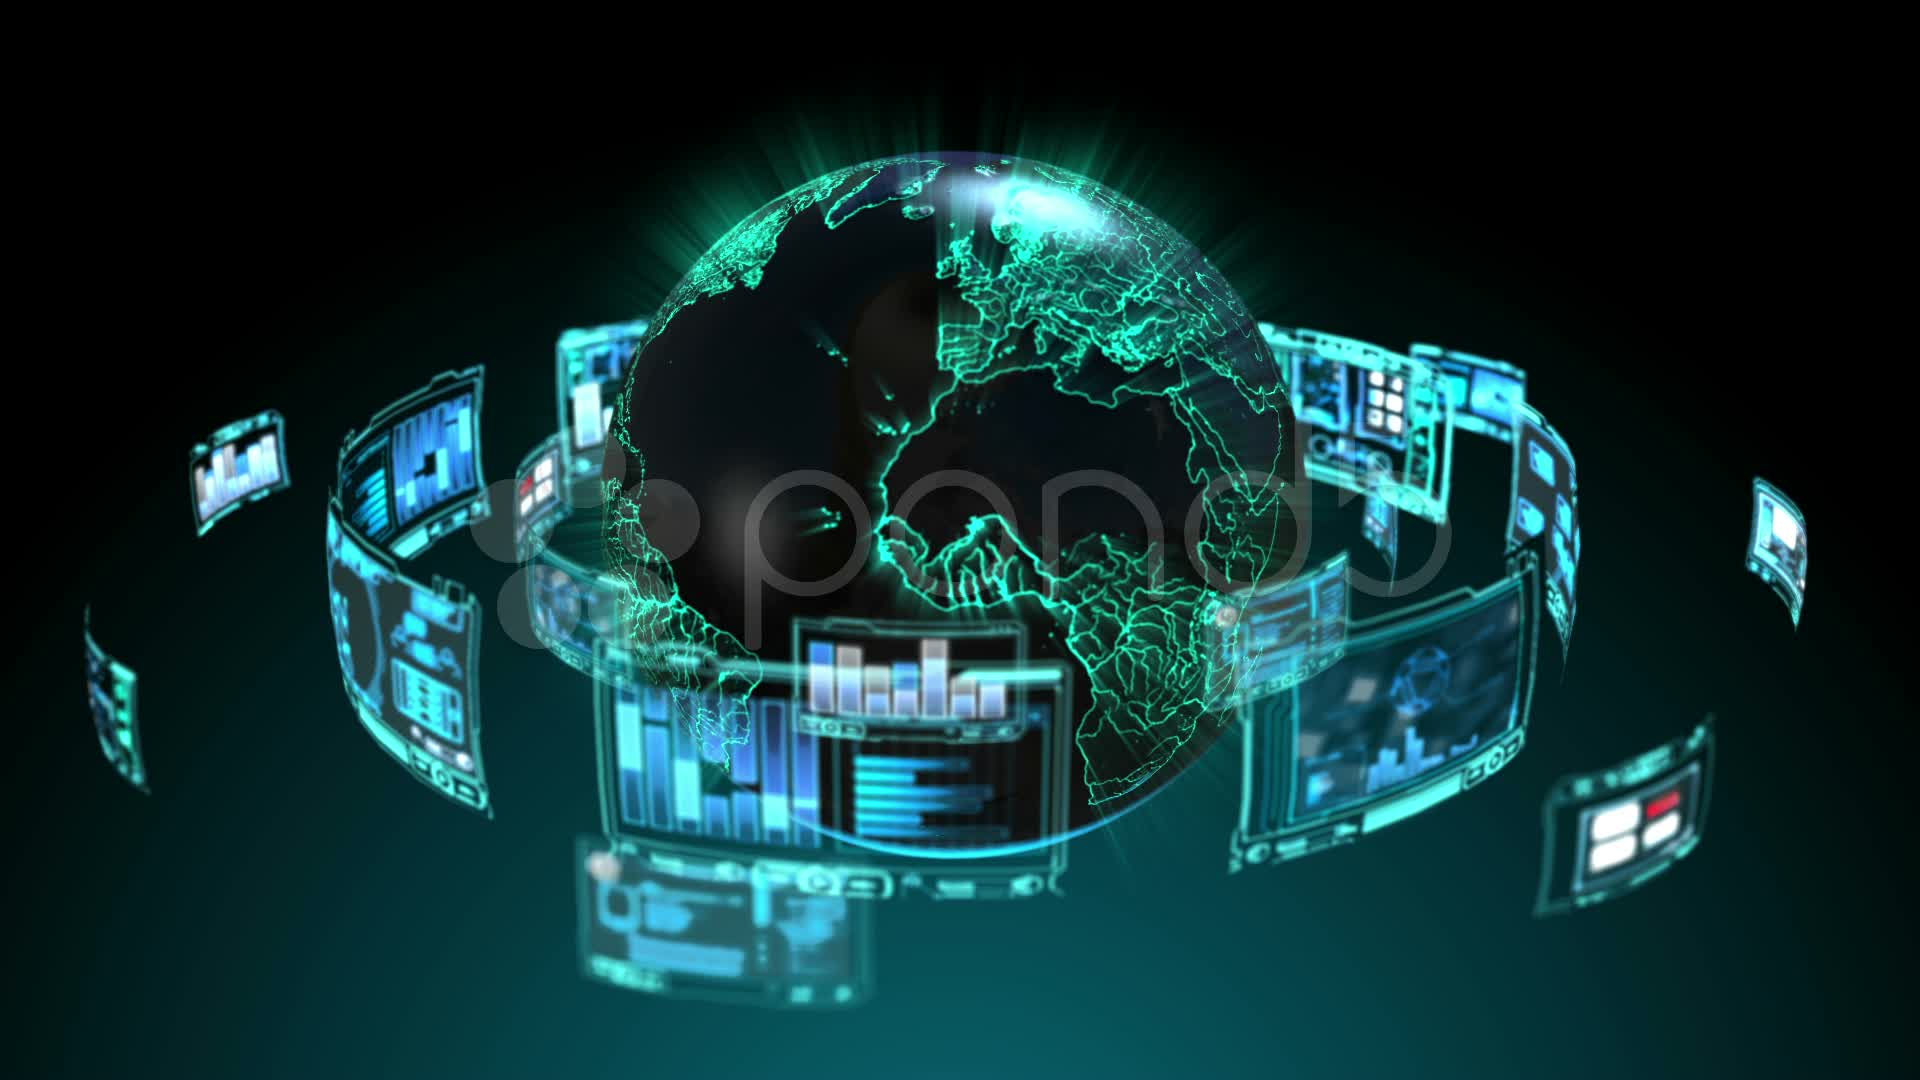 comunicazioni sicure & identità digitale